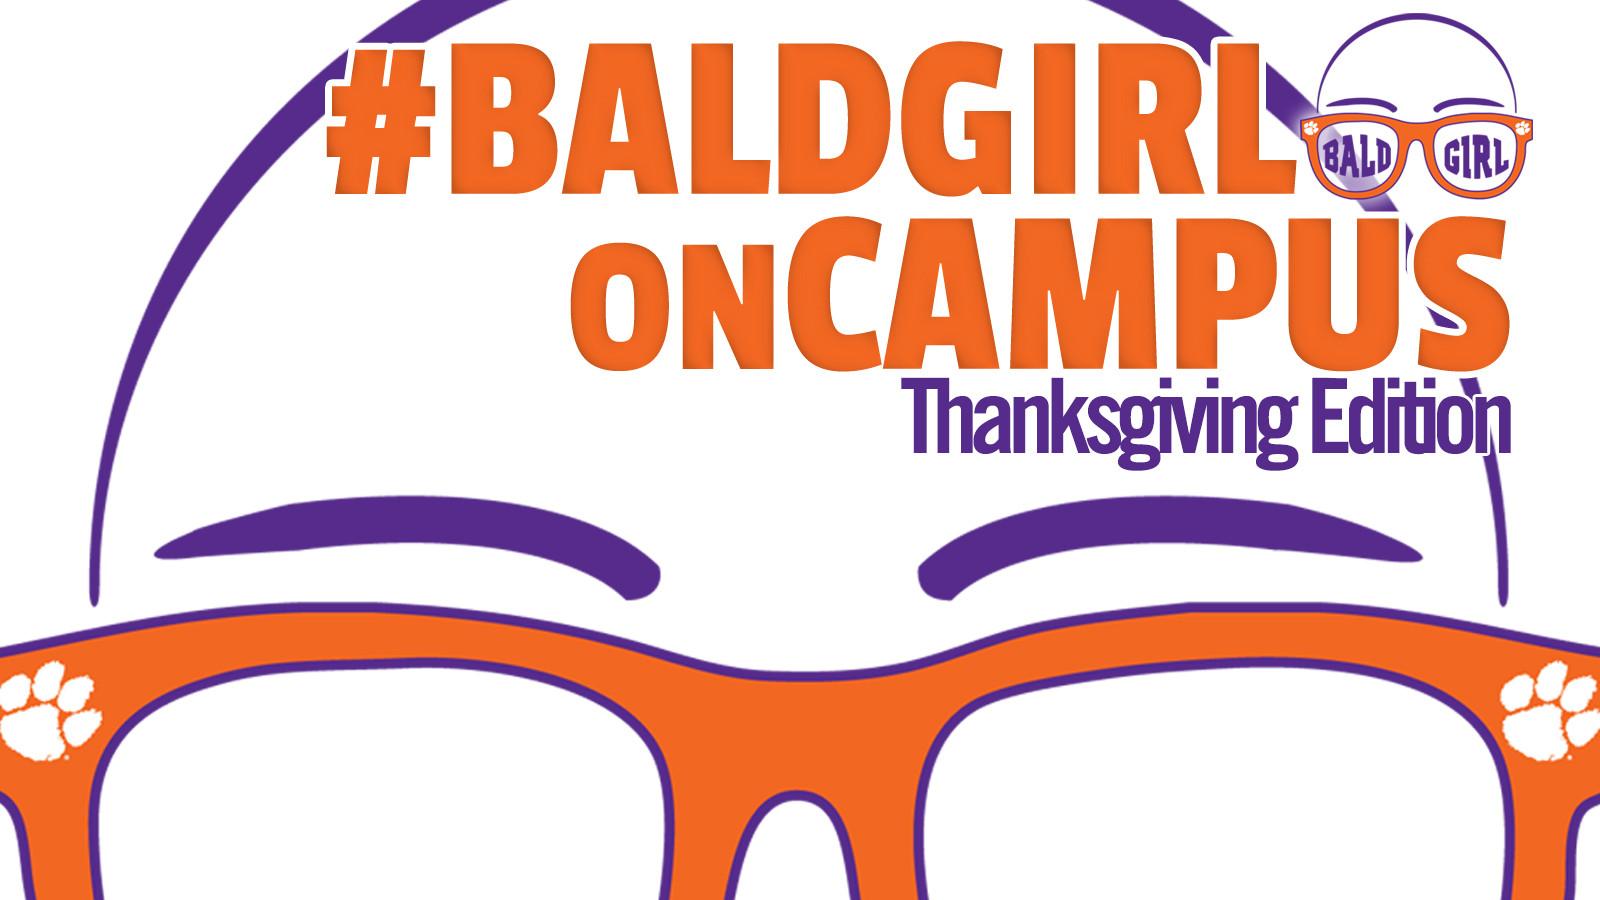 ClemsonTigers.com's Bald Girl on Campus: Thanksgiving